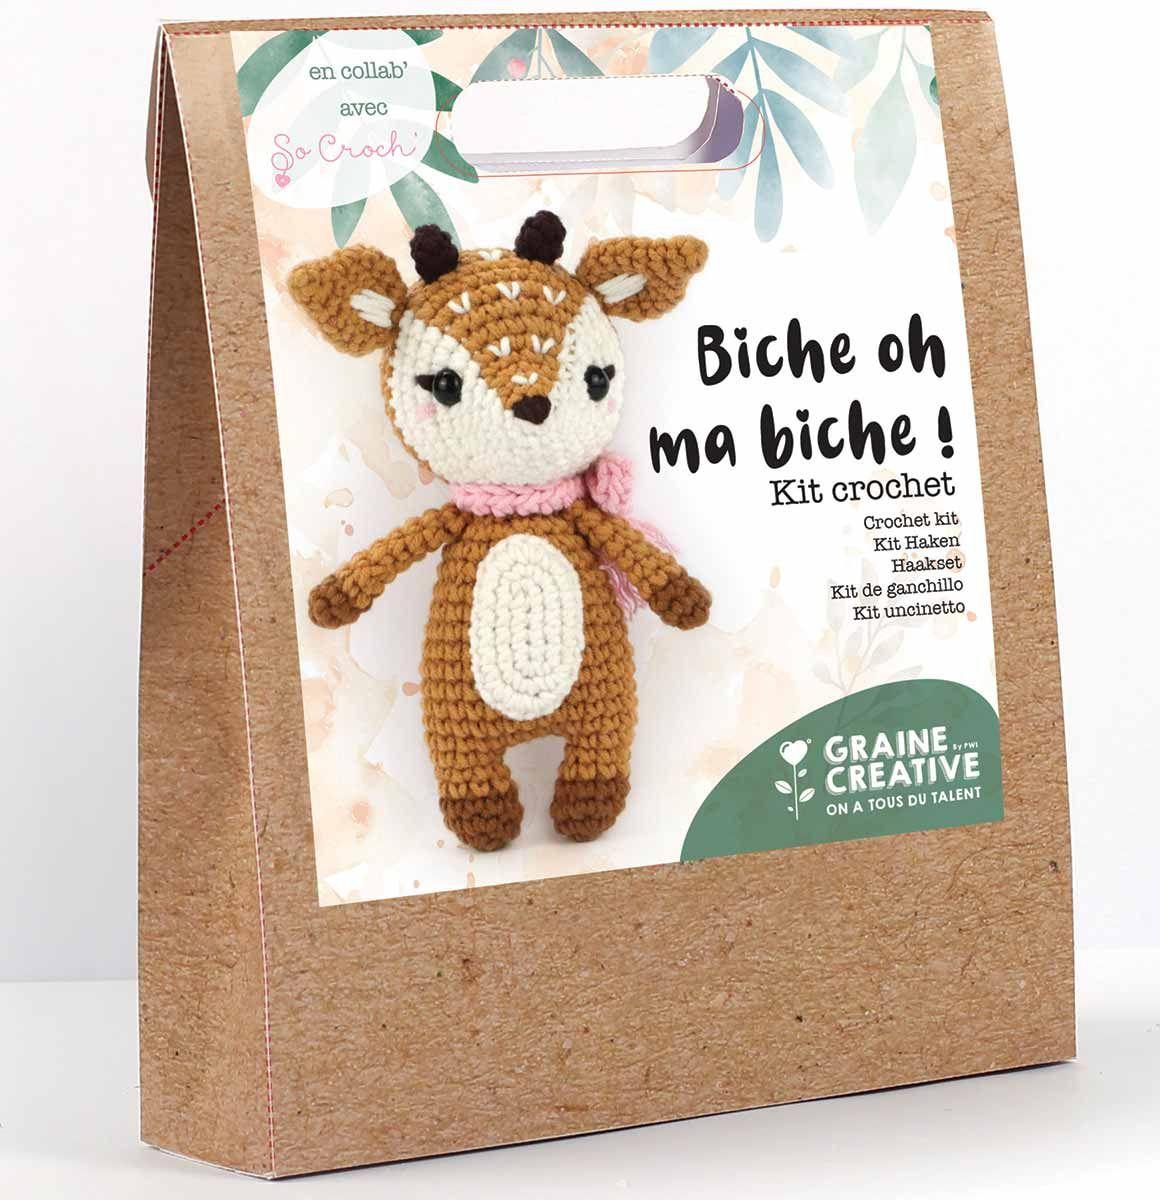 Kit crochet - Biche oh ma biche !